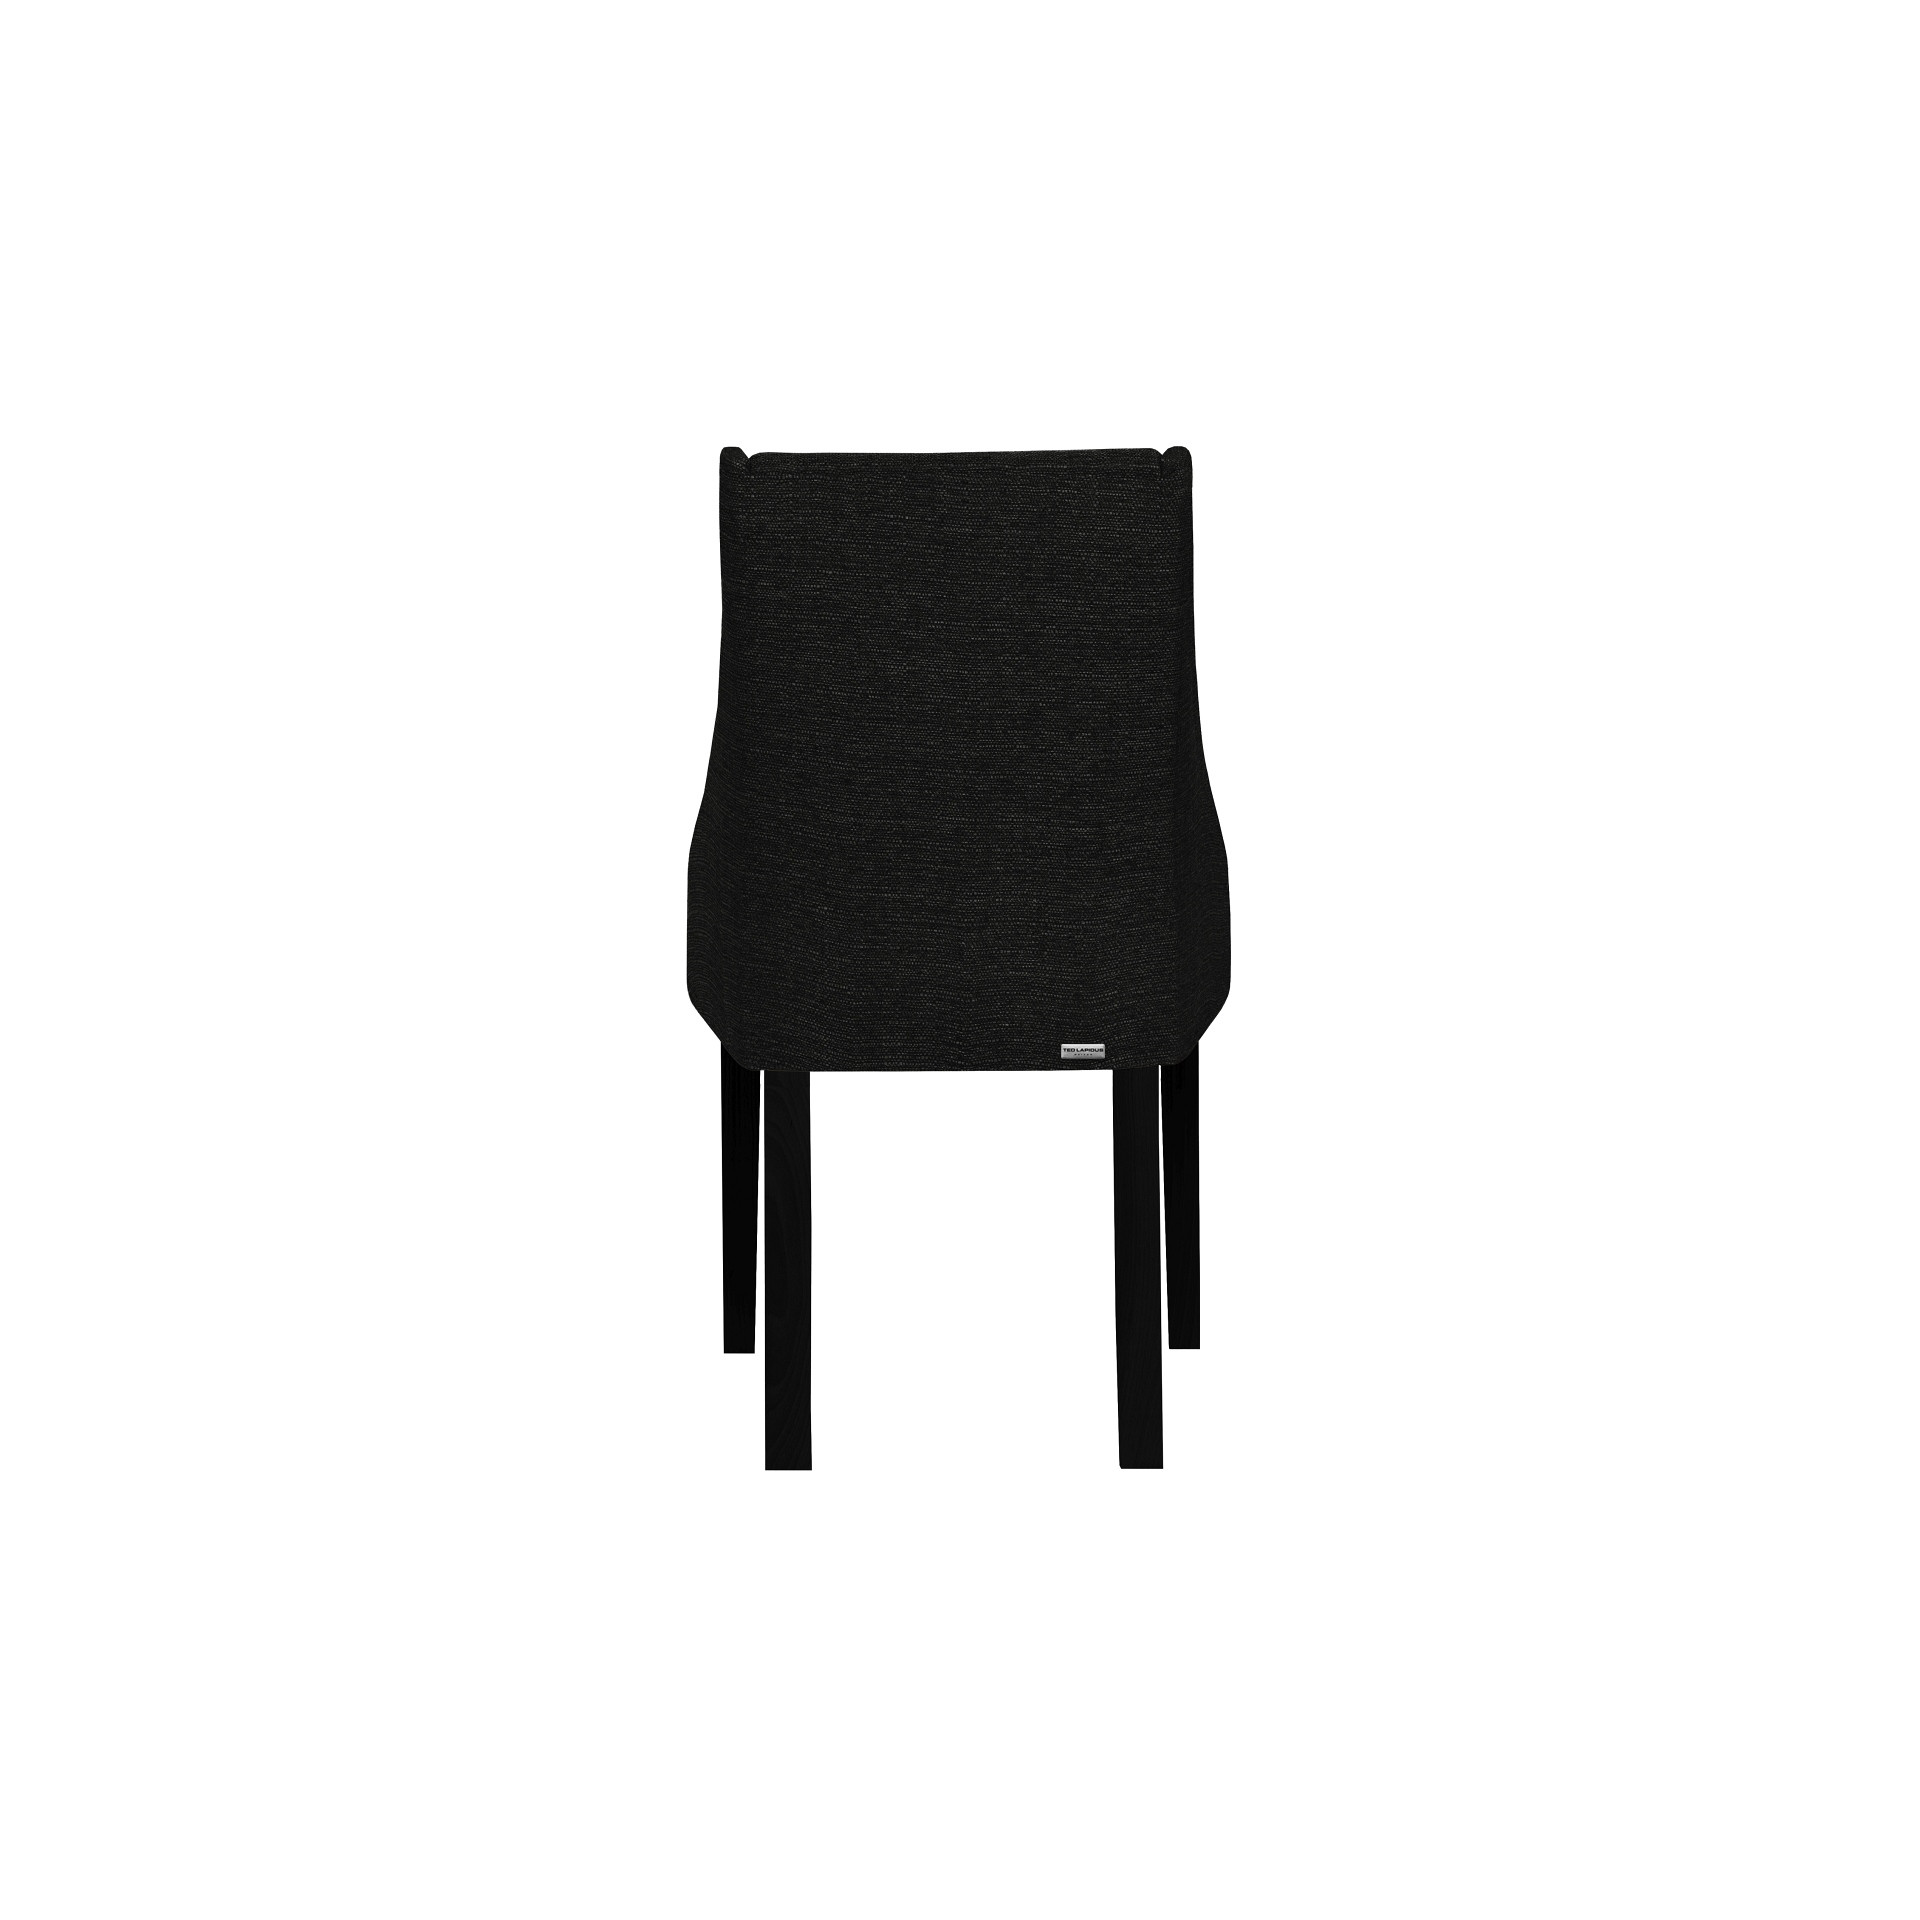 Fauteuil Absolu | Pieds noirs | Dossier noir | Lot de 2